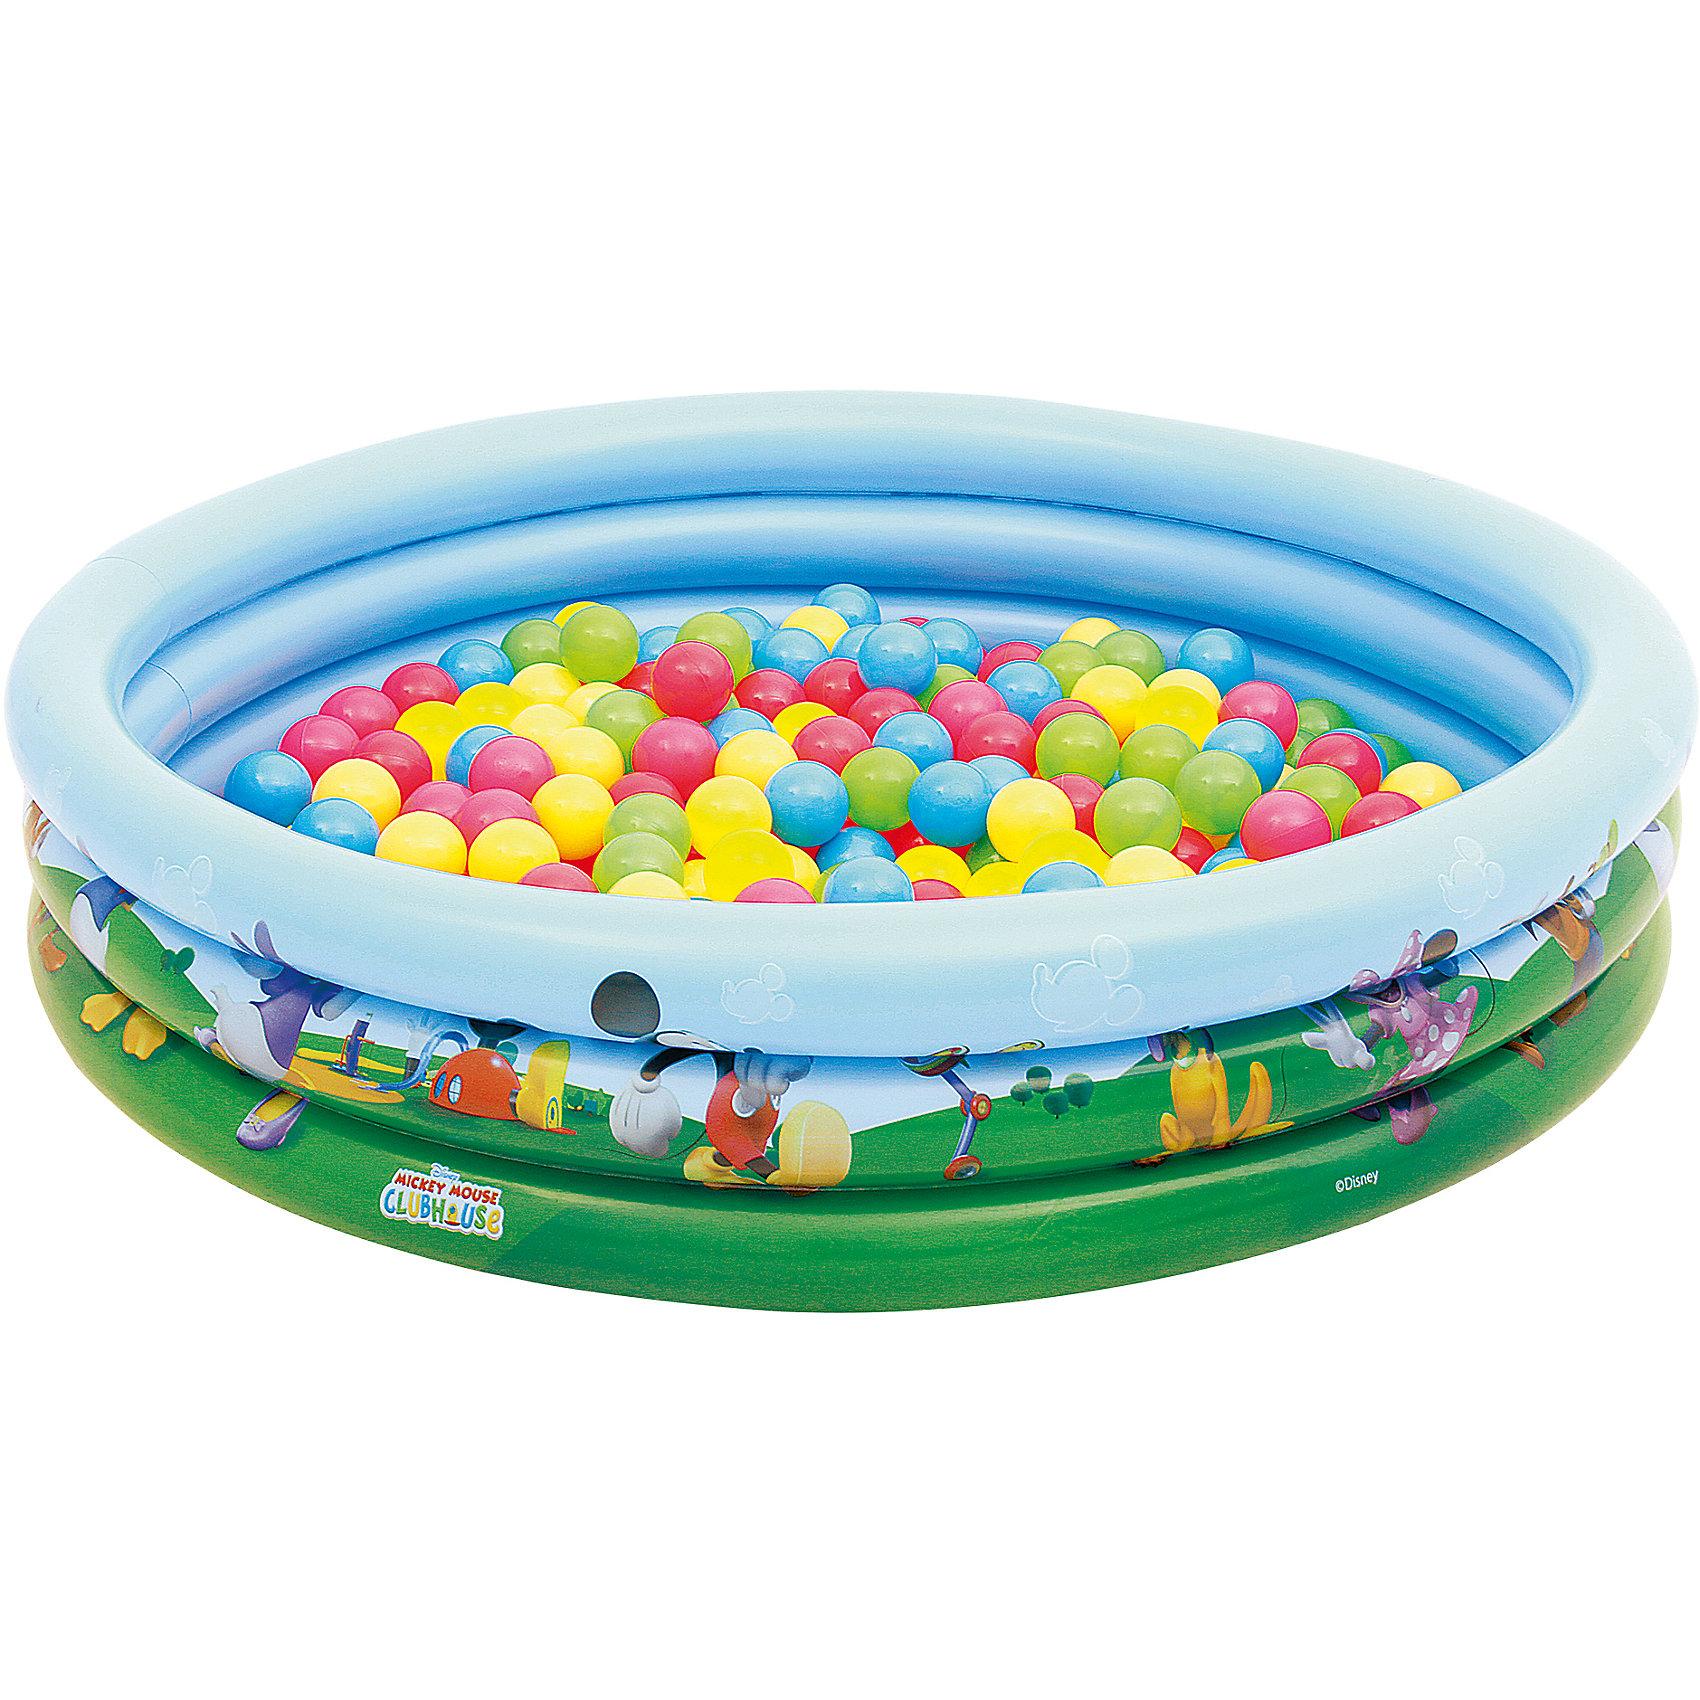 Bestway Детский круглый бассейн (140 л) + 75 шариков, Bestway